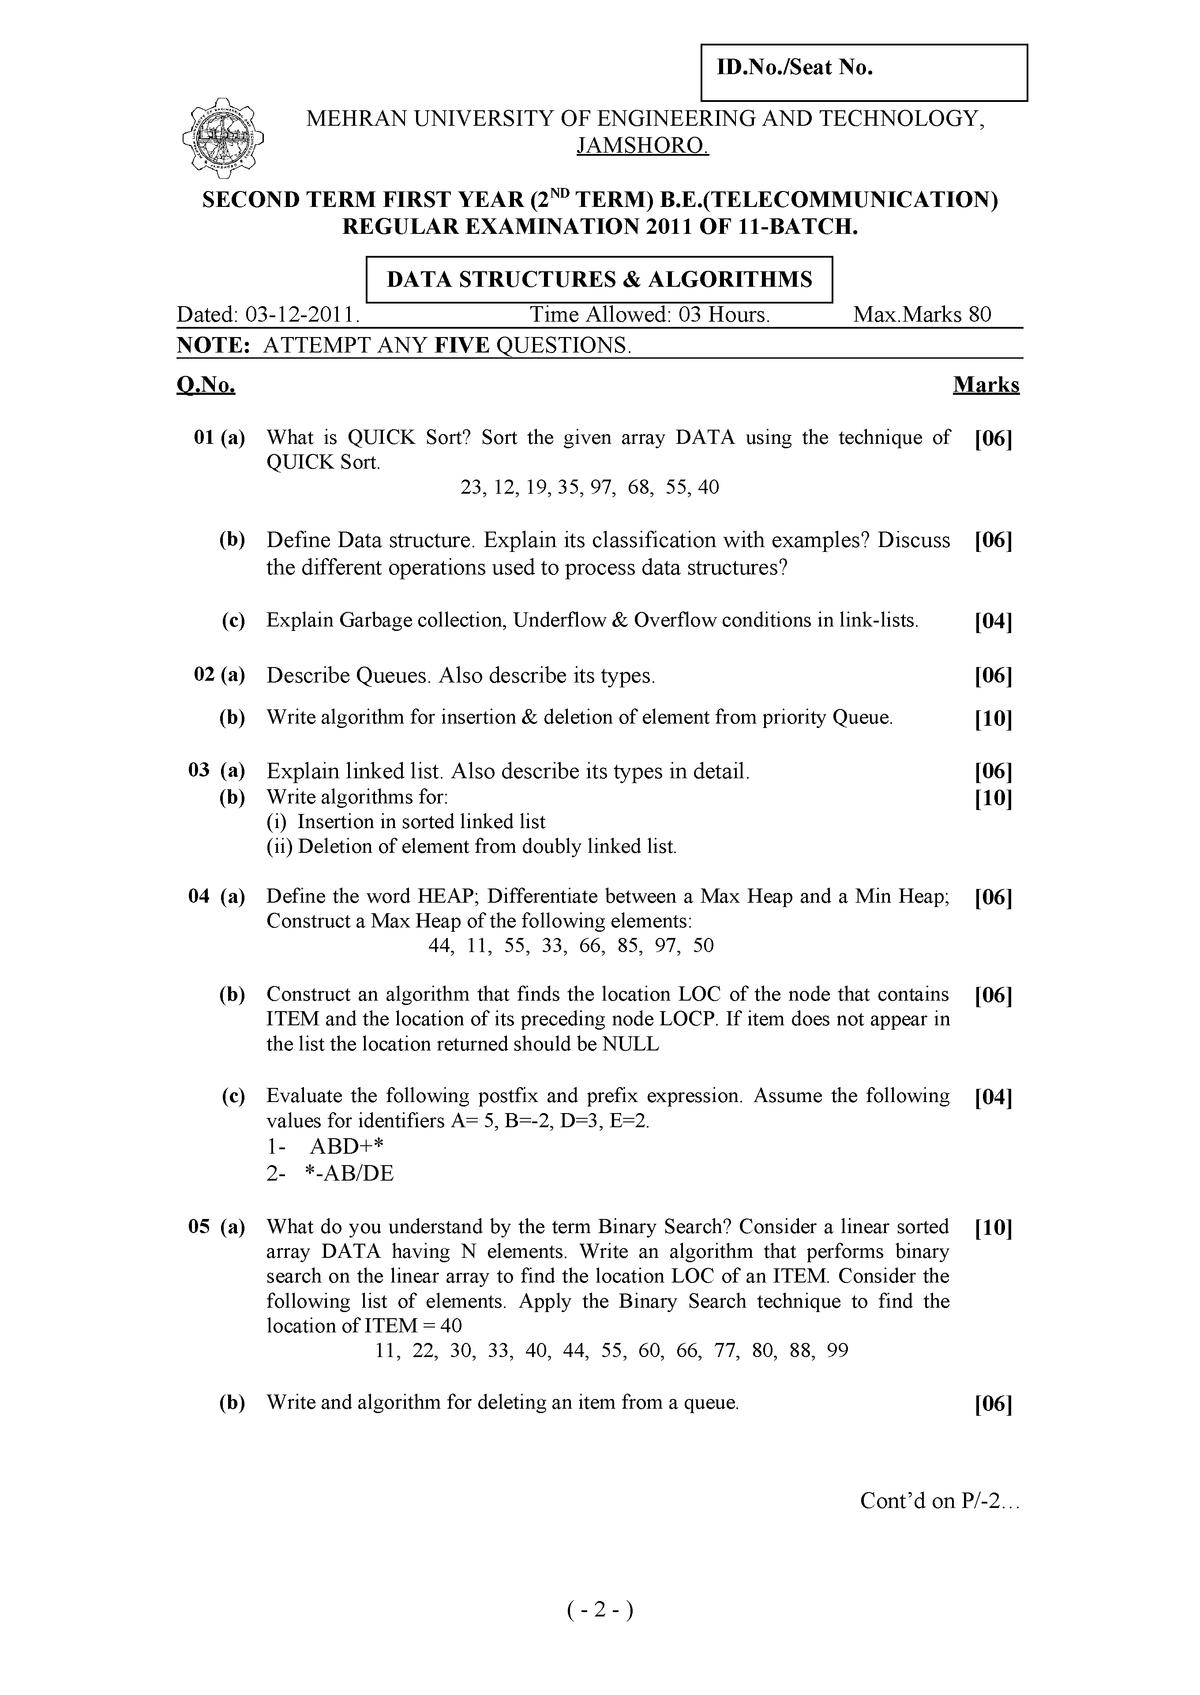 03-12 Data Structure & Algorithms (TL) - TL: Telecommunication